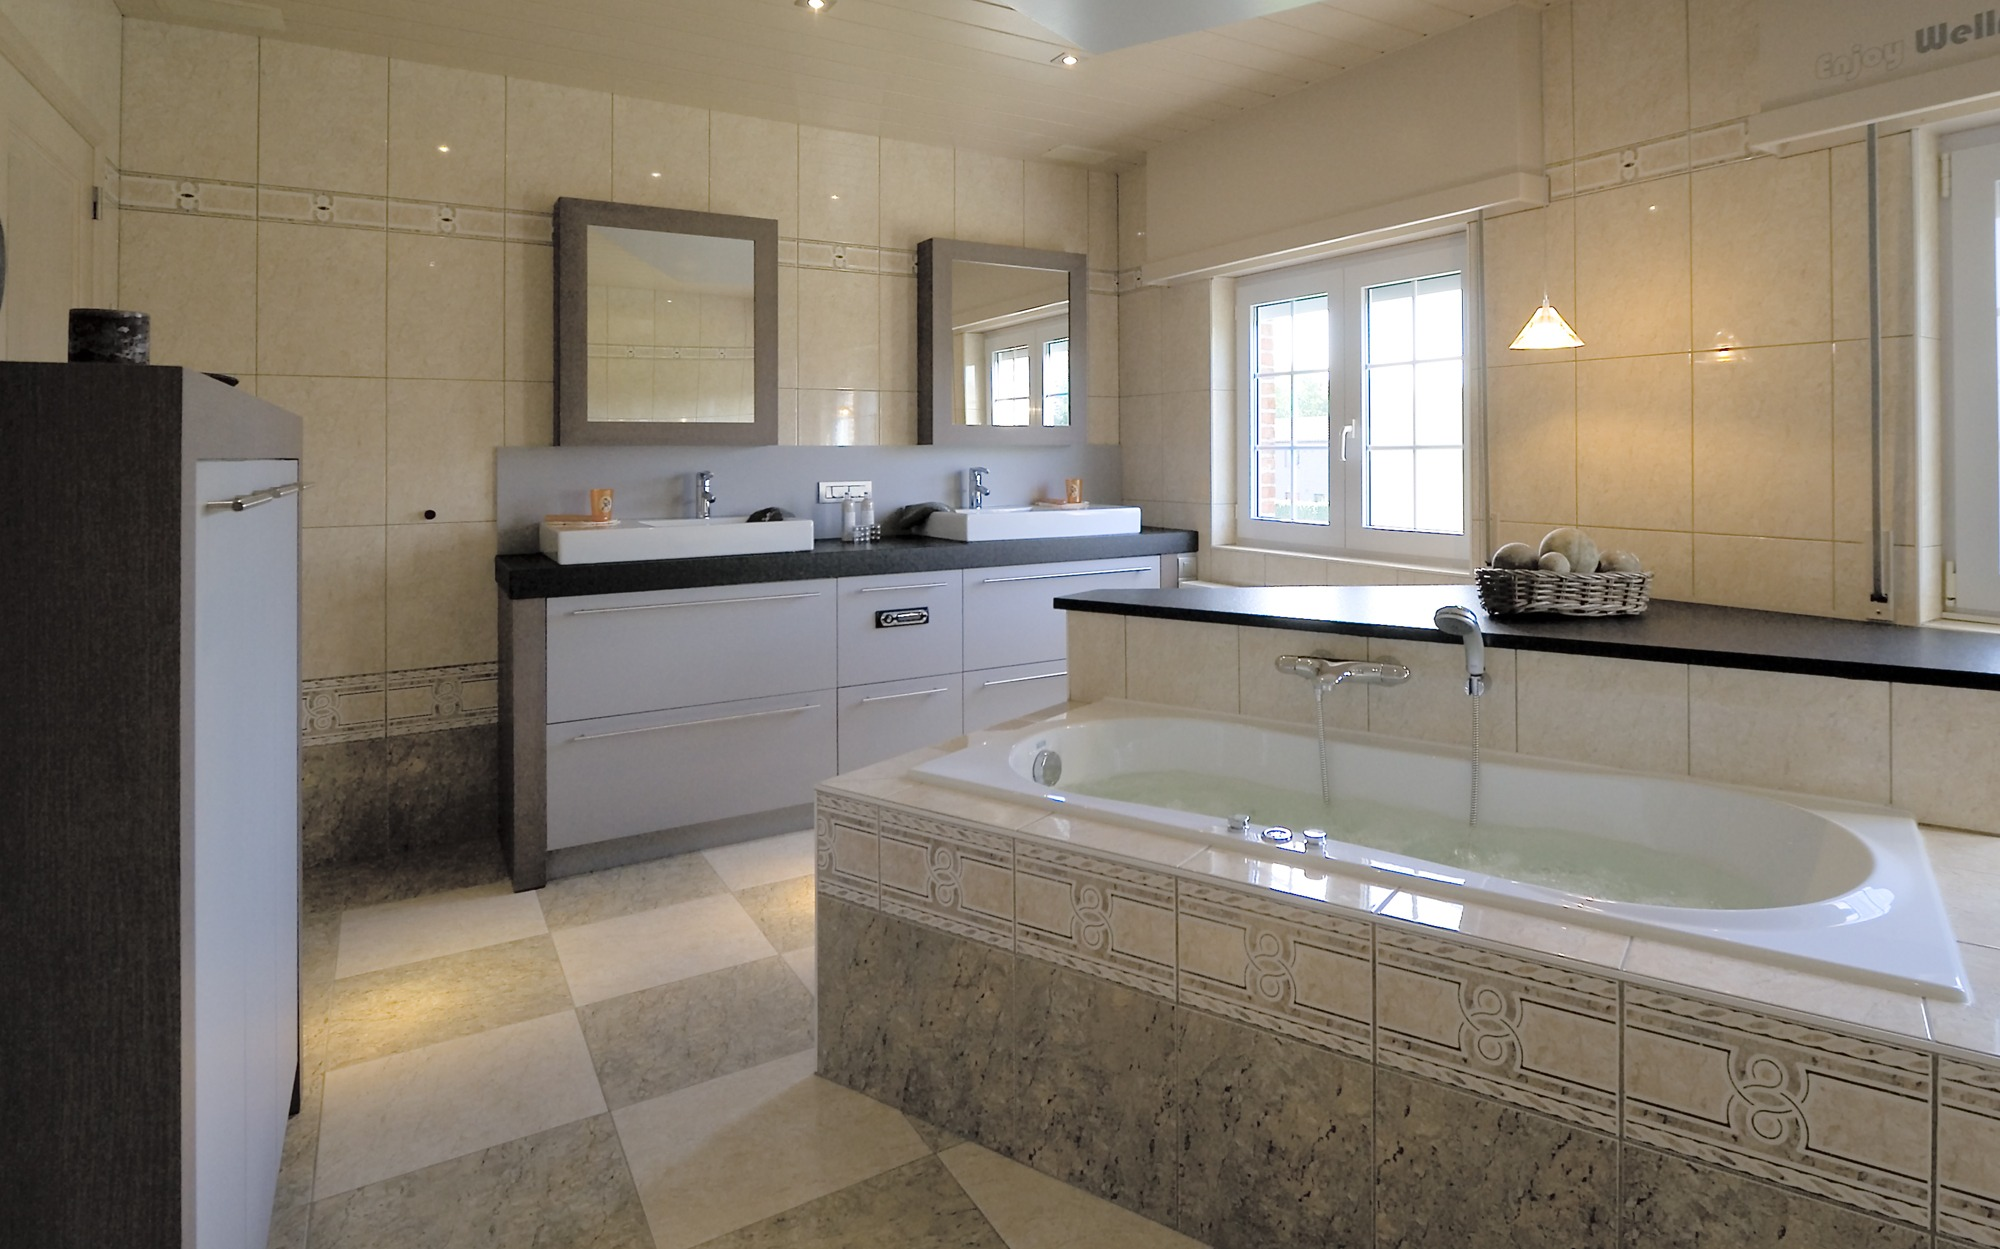 Keuken badkamer tiel best images about badkamer interieur for Interieur opleiding mbo